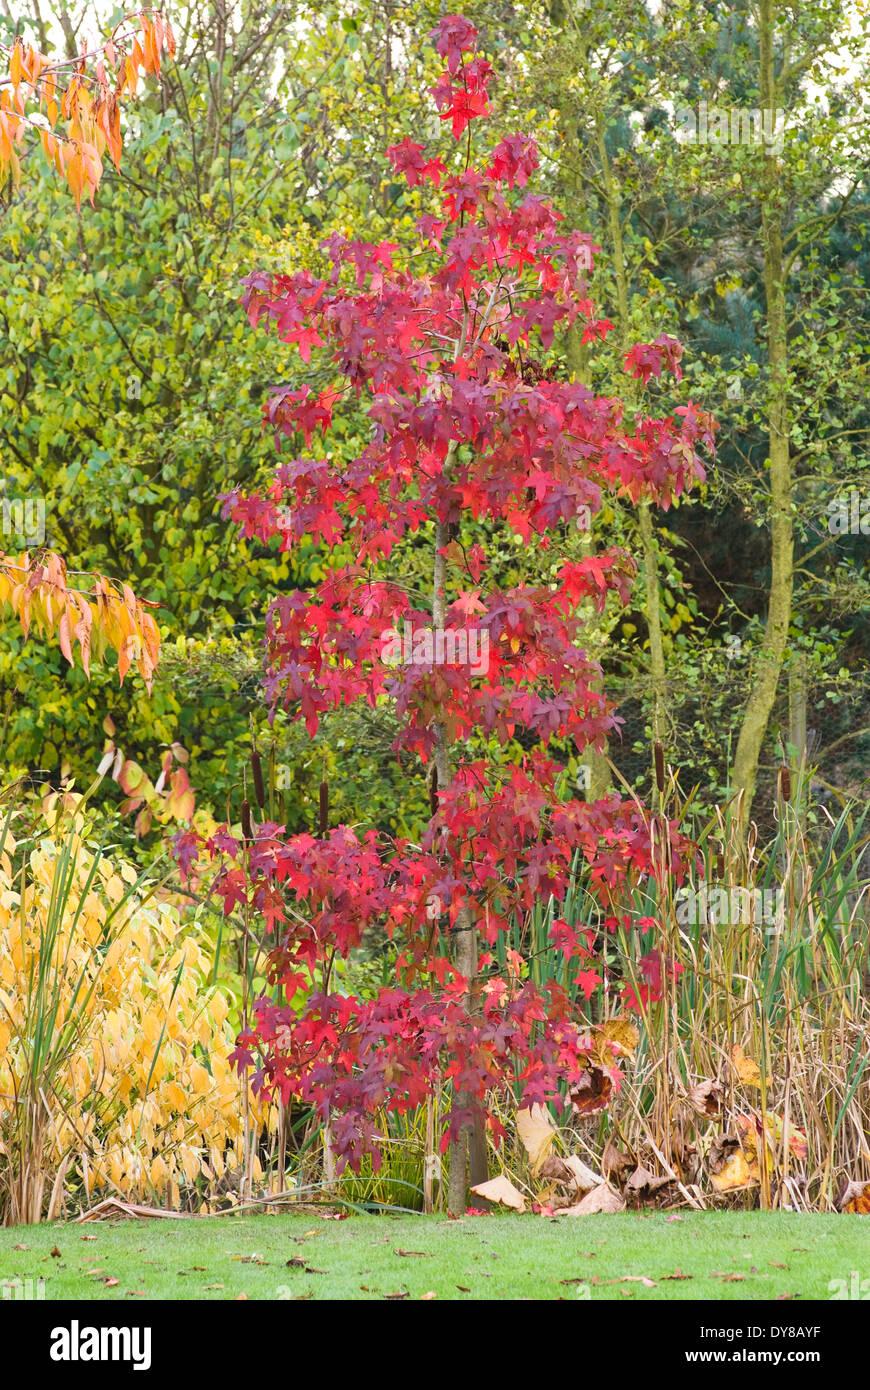 Liquidambar Styraciflua Festival Sweetgum Tree October Autumn Stock Photo Alamy